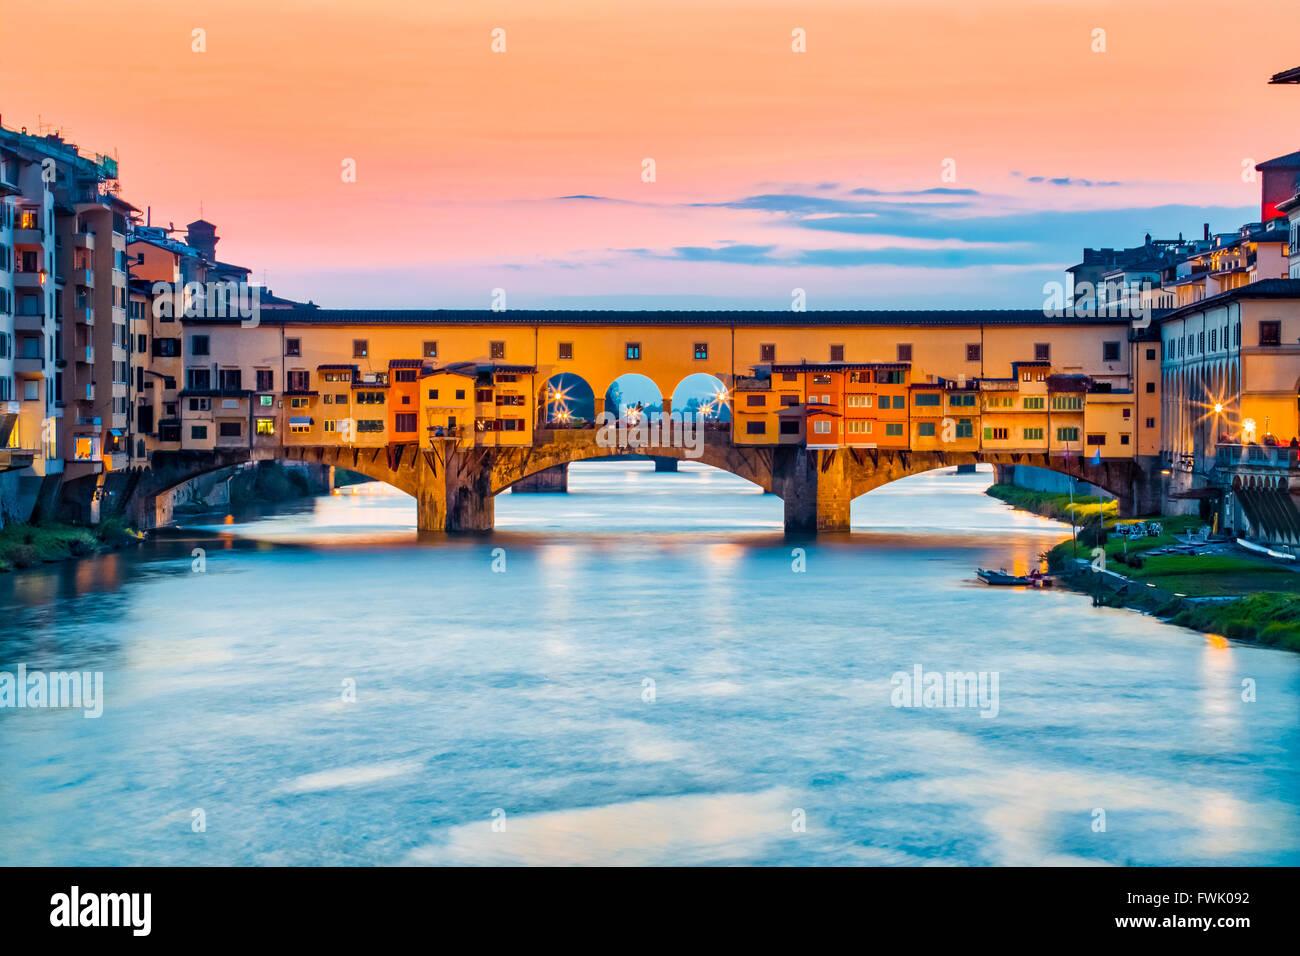 The Ponte Vecchio bridge in Florence, Italy. - Stock Image